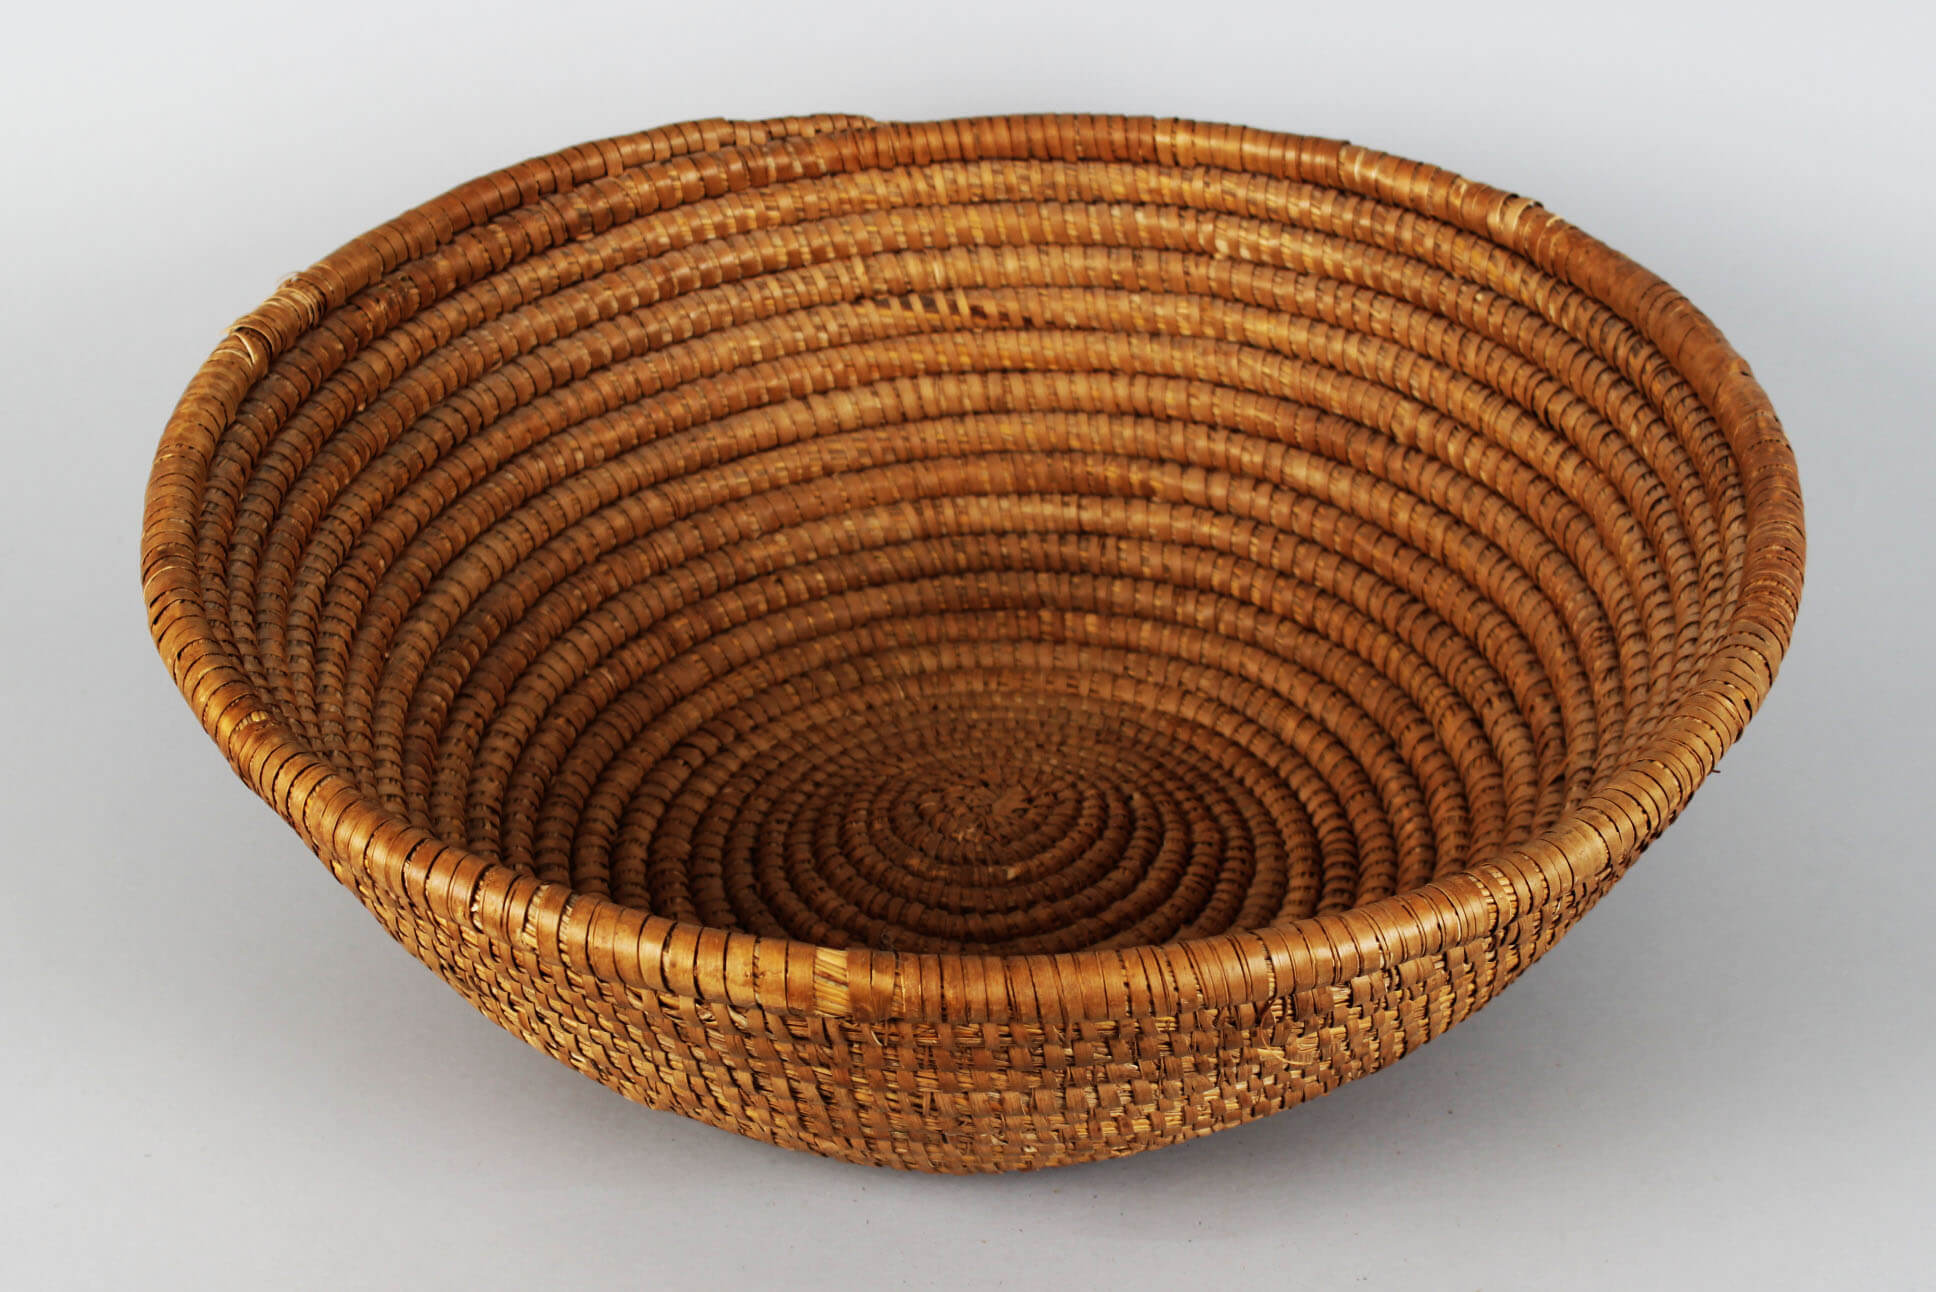 Shoshone Native Indian Bowl Large Weaved Basket58047_01